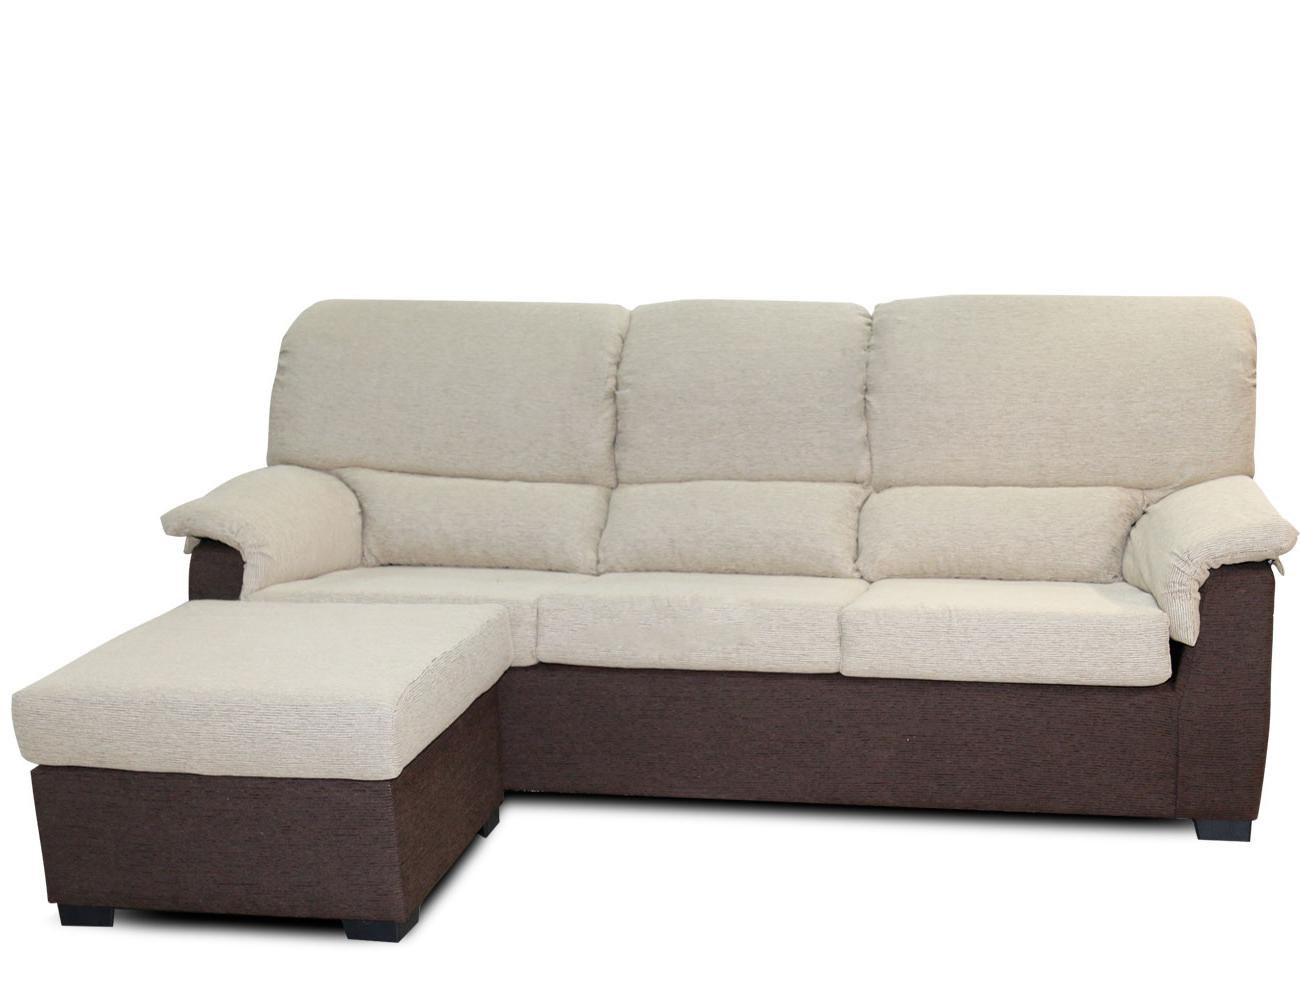 Sofa Chaise Longue Barato Dddy sofà S Chaiselongue Econà Micos Factory Del Mueble Utrera